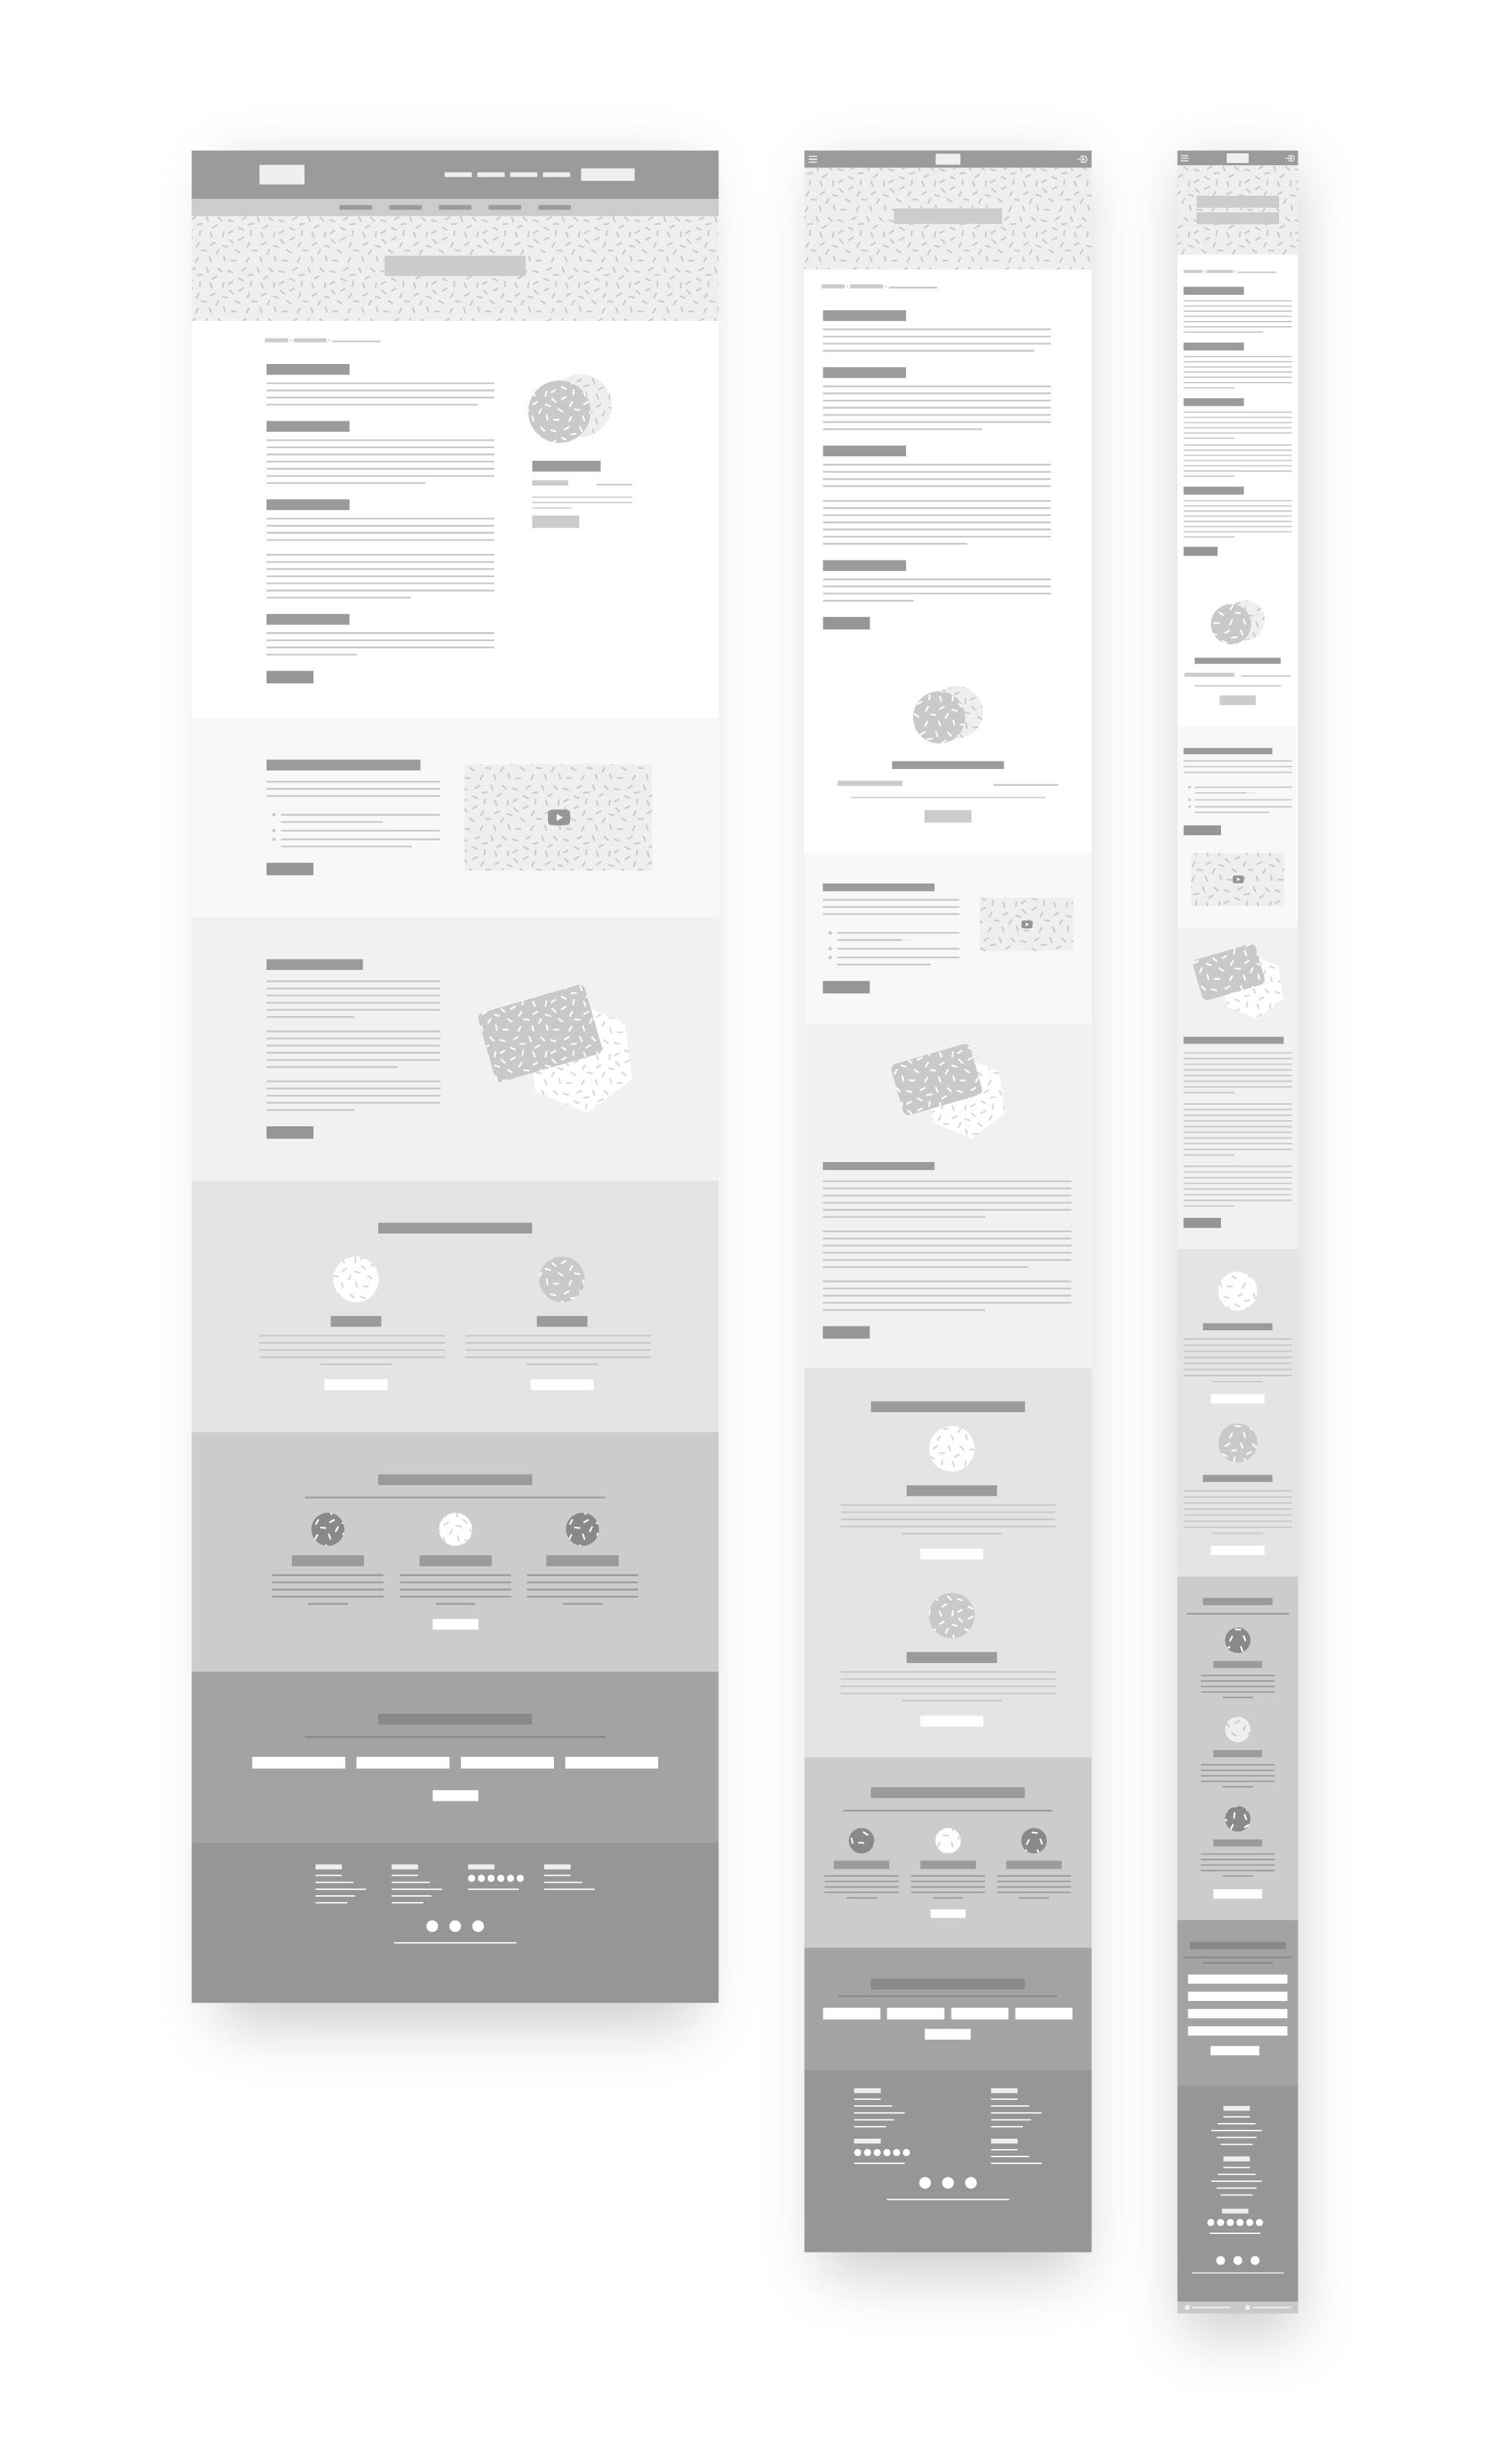 medium fidelity product page